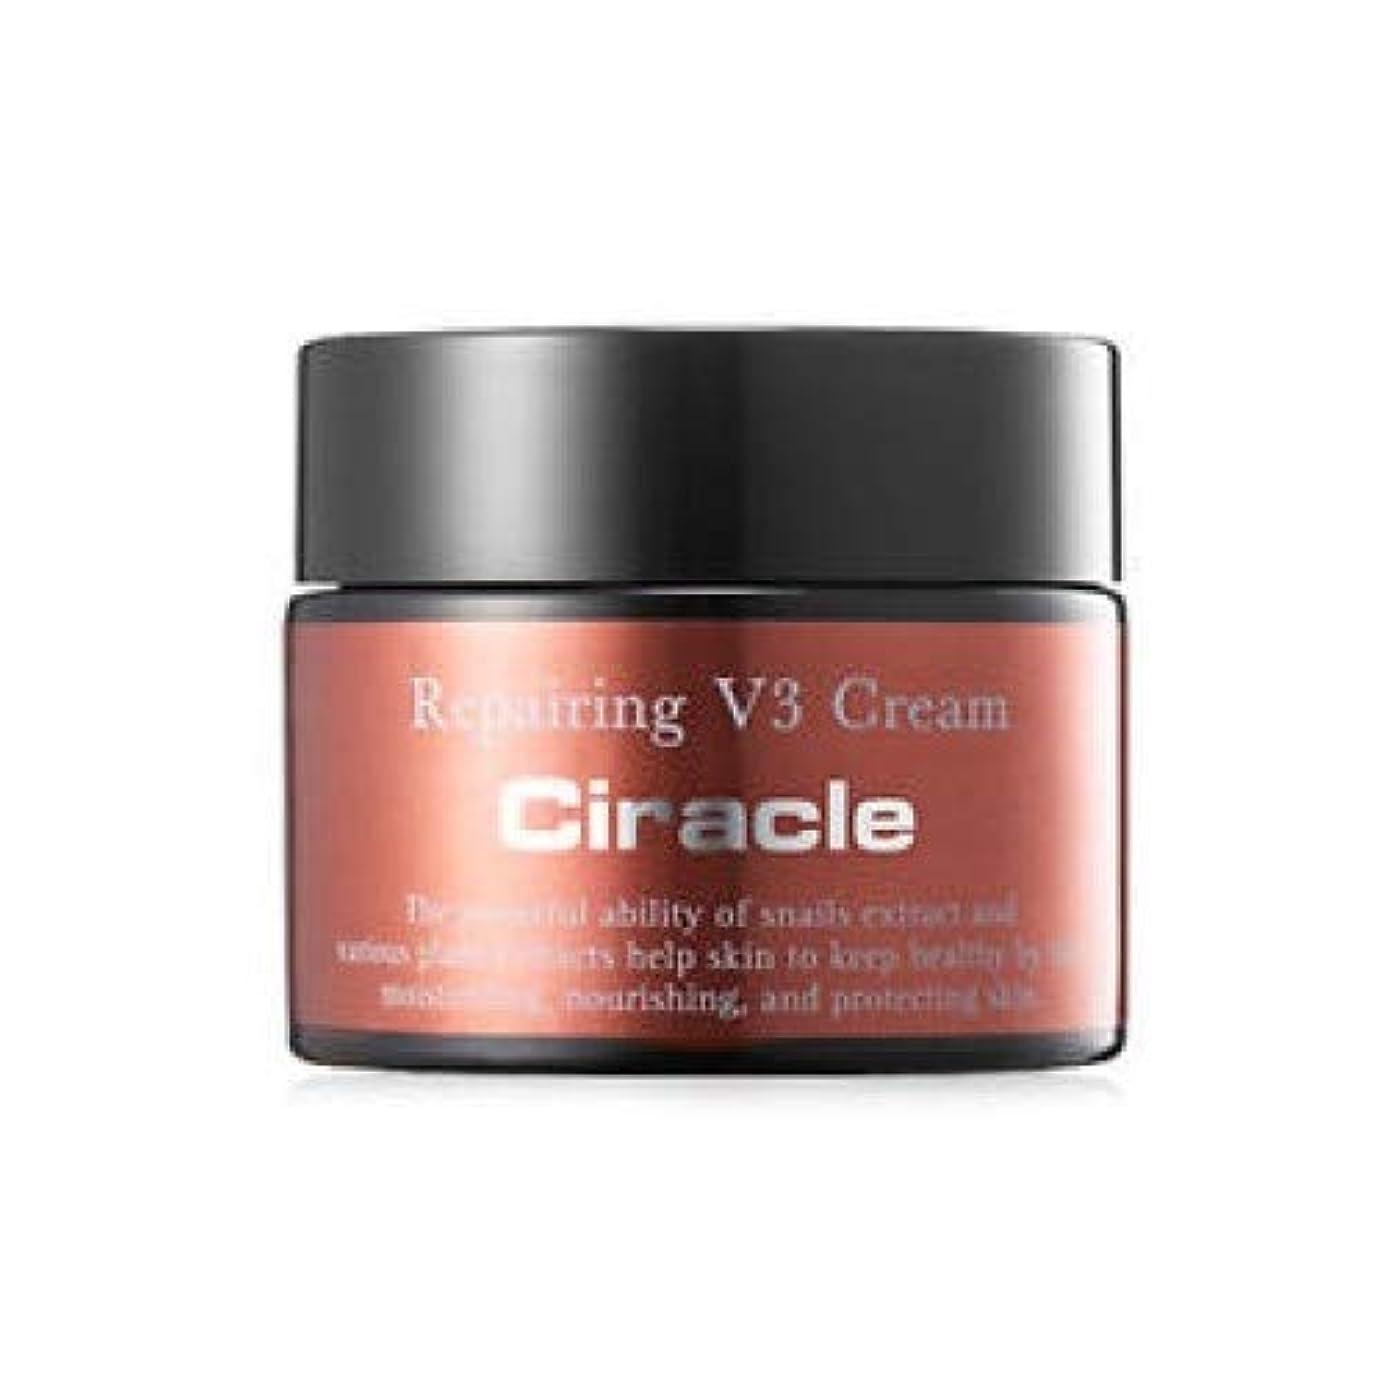 Ciracle シラクル リペアリング スネイル V3クリーム 毛穴ケア 乳液 保湿効果 美白 トラブル肌